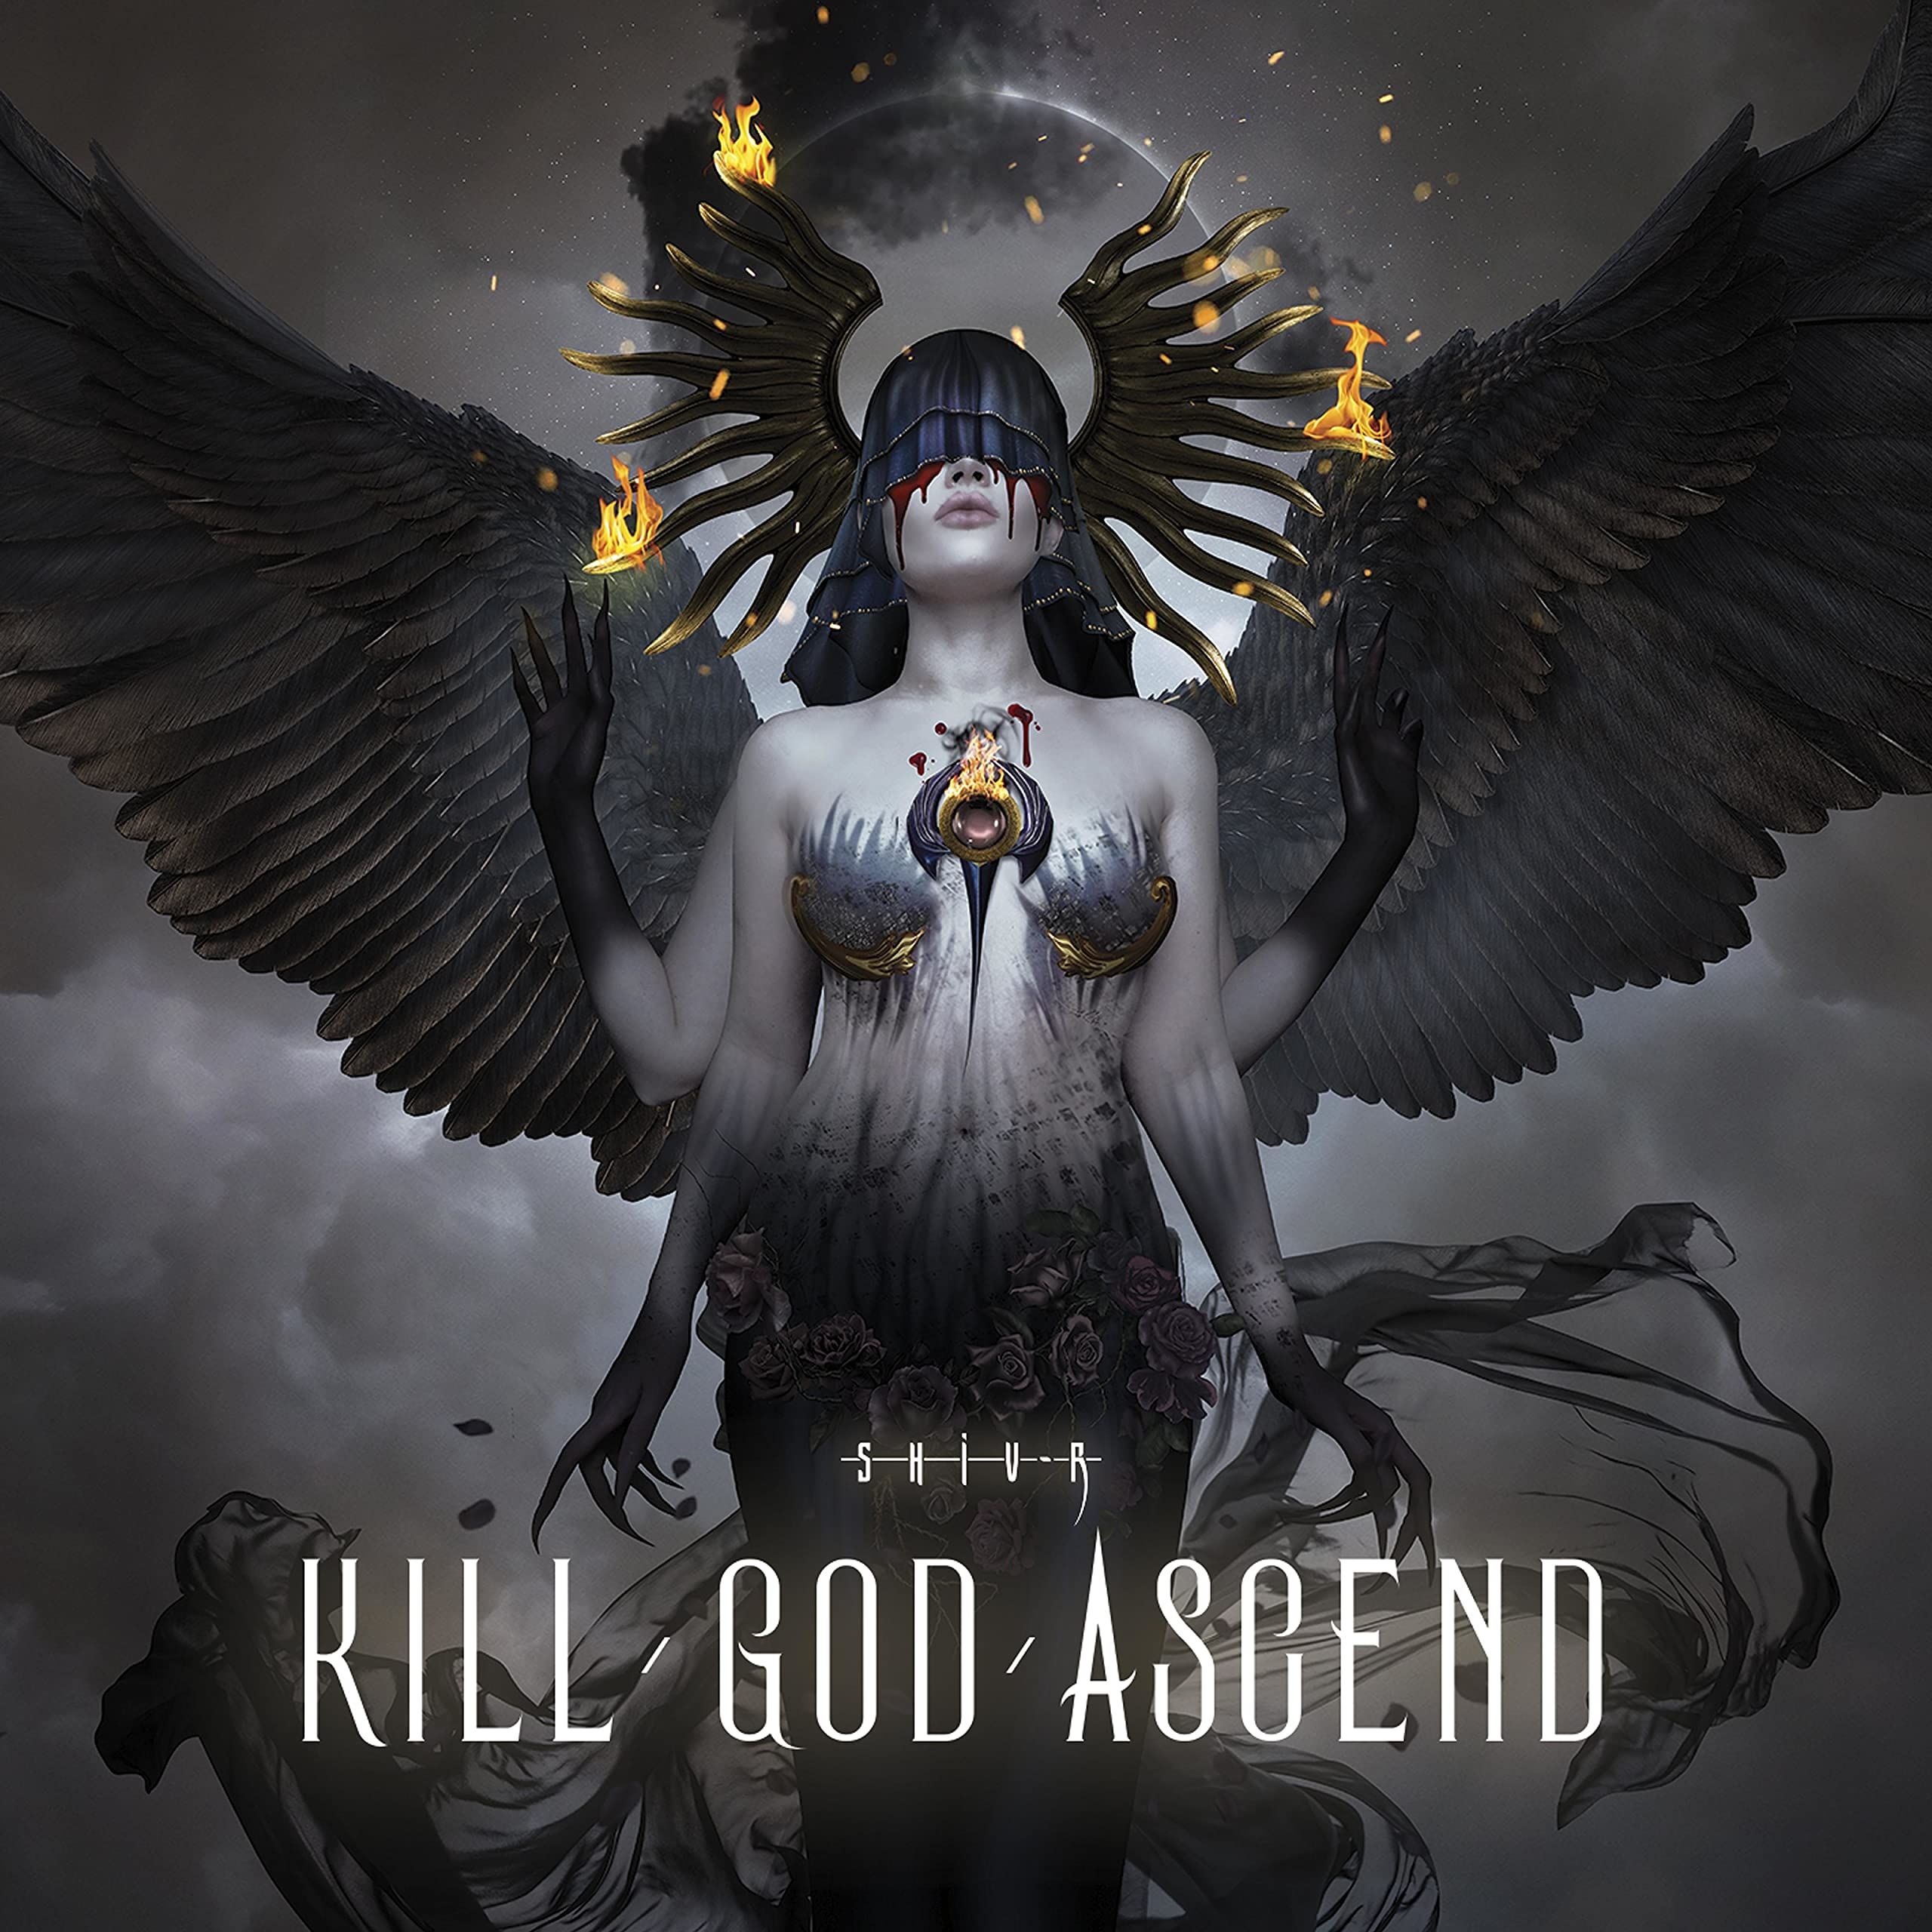 Shiv-R - Kill God Ascend (2021) [FLAC] Download